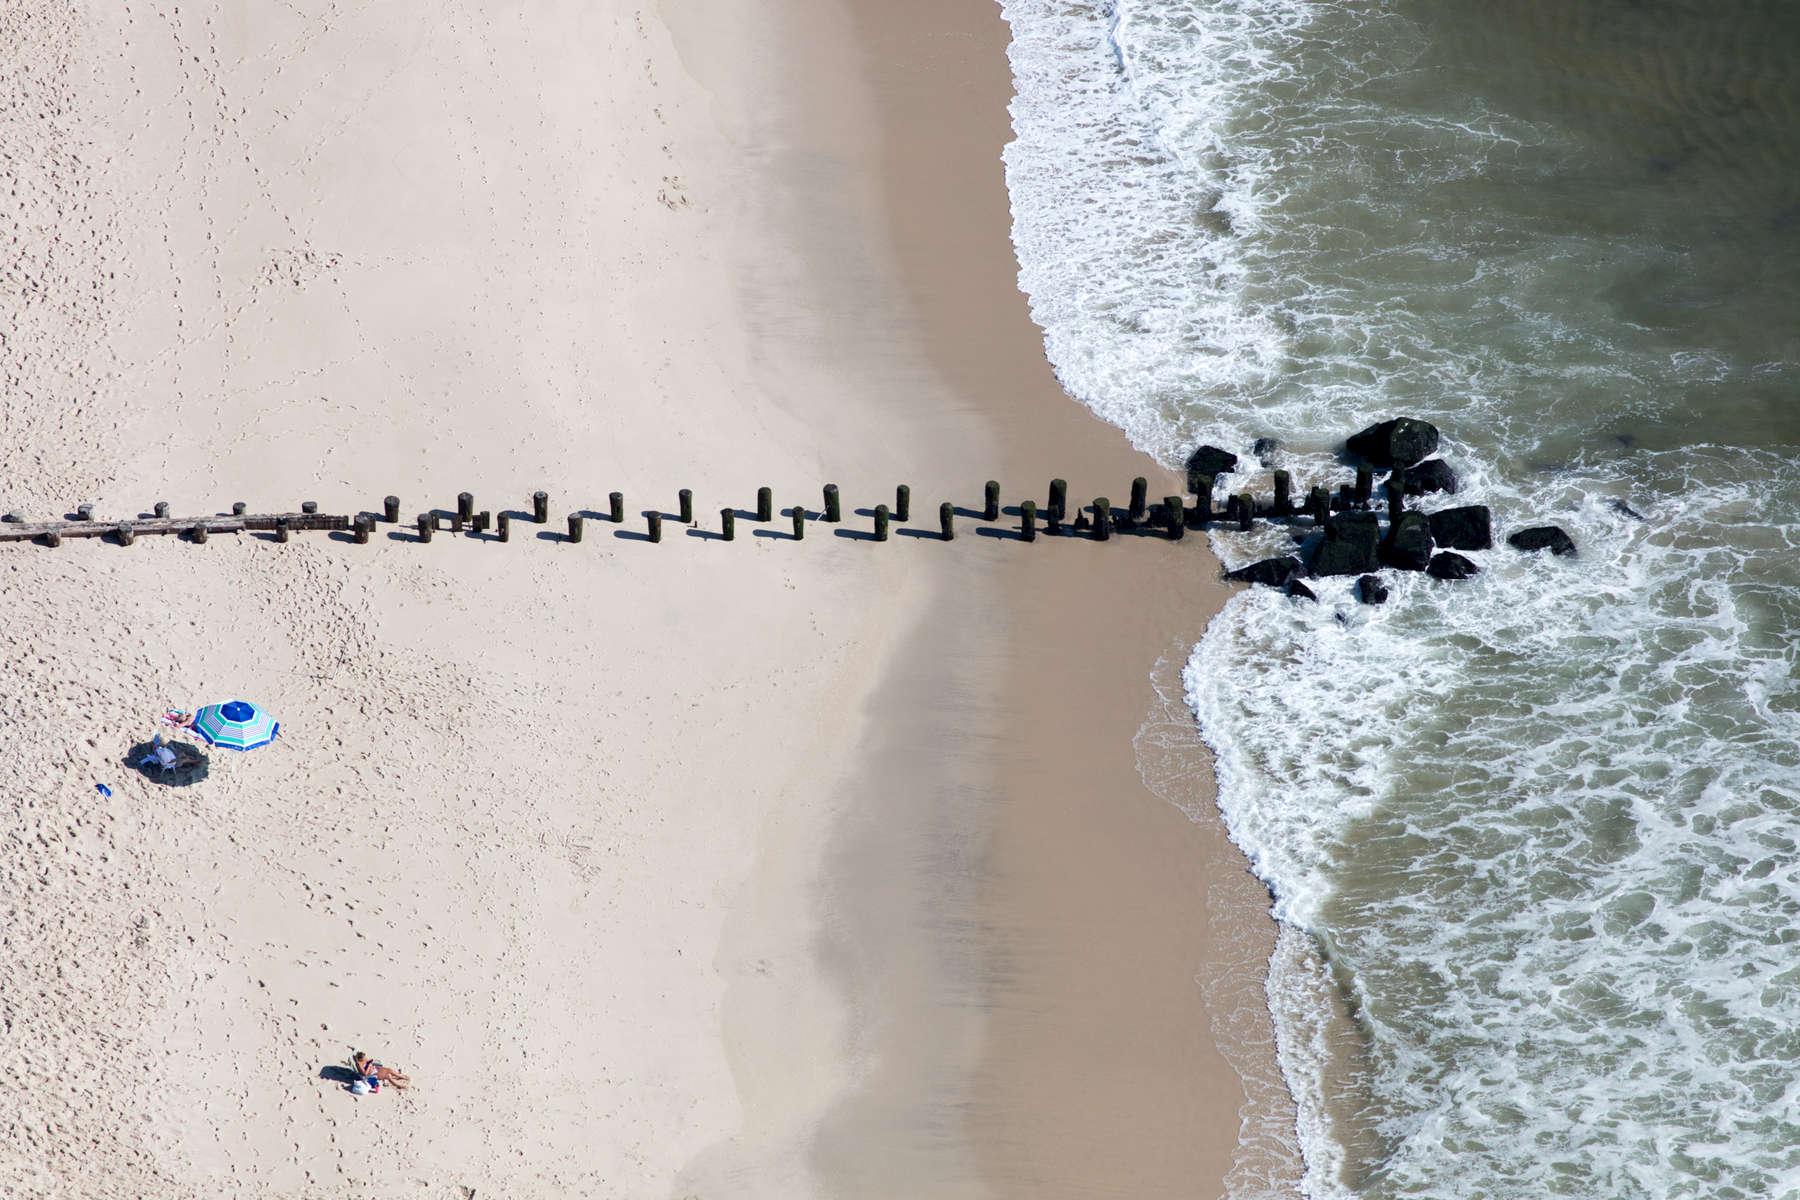 Beach Pilings, Bay Head, New Jersey 2018 (180904-0109)